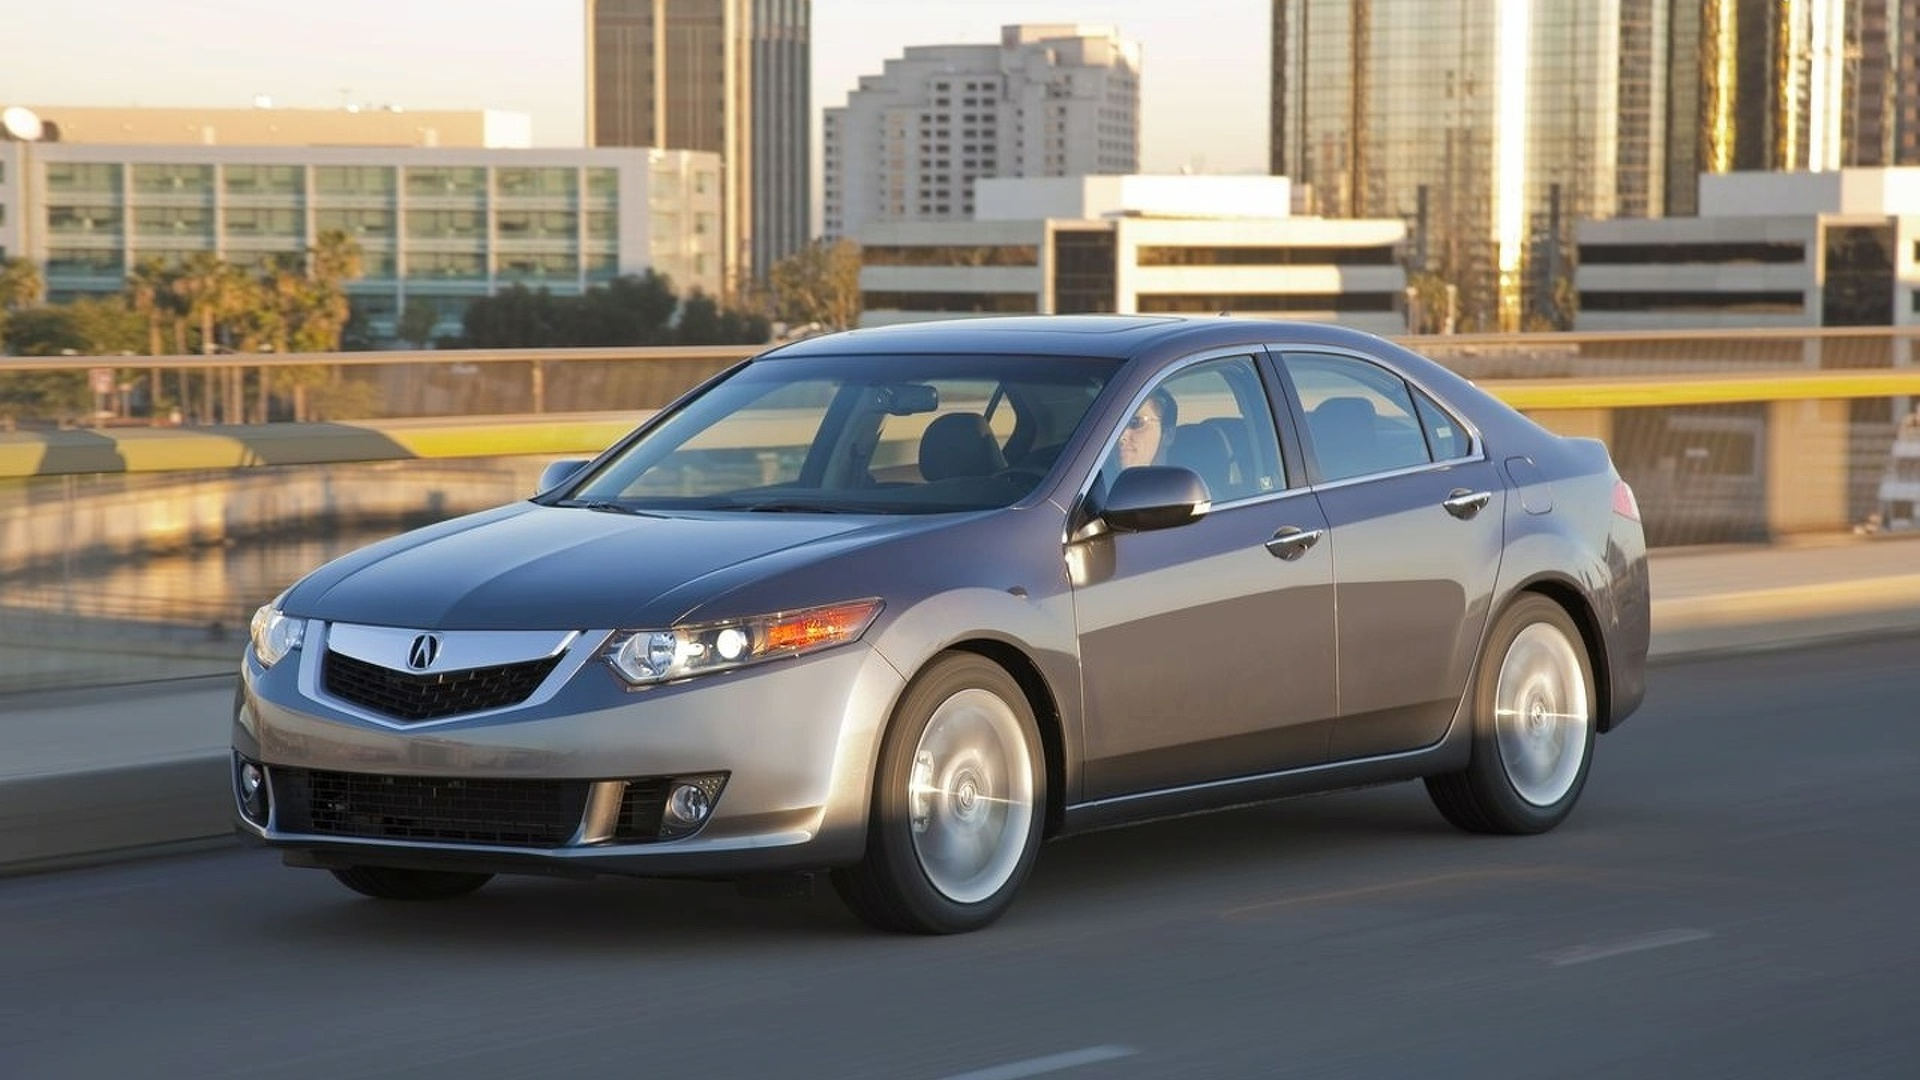 2010 Acura TSX V-6 Debuts at Chicago Auto Show